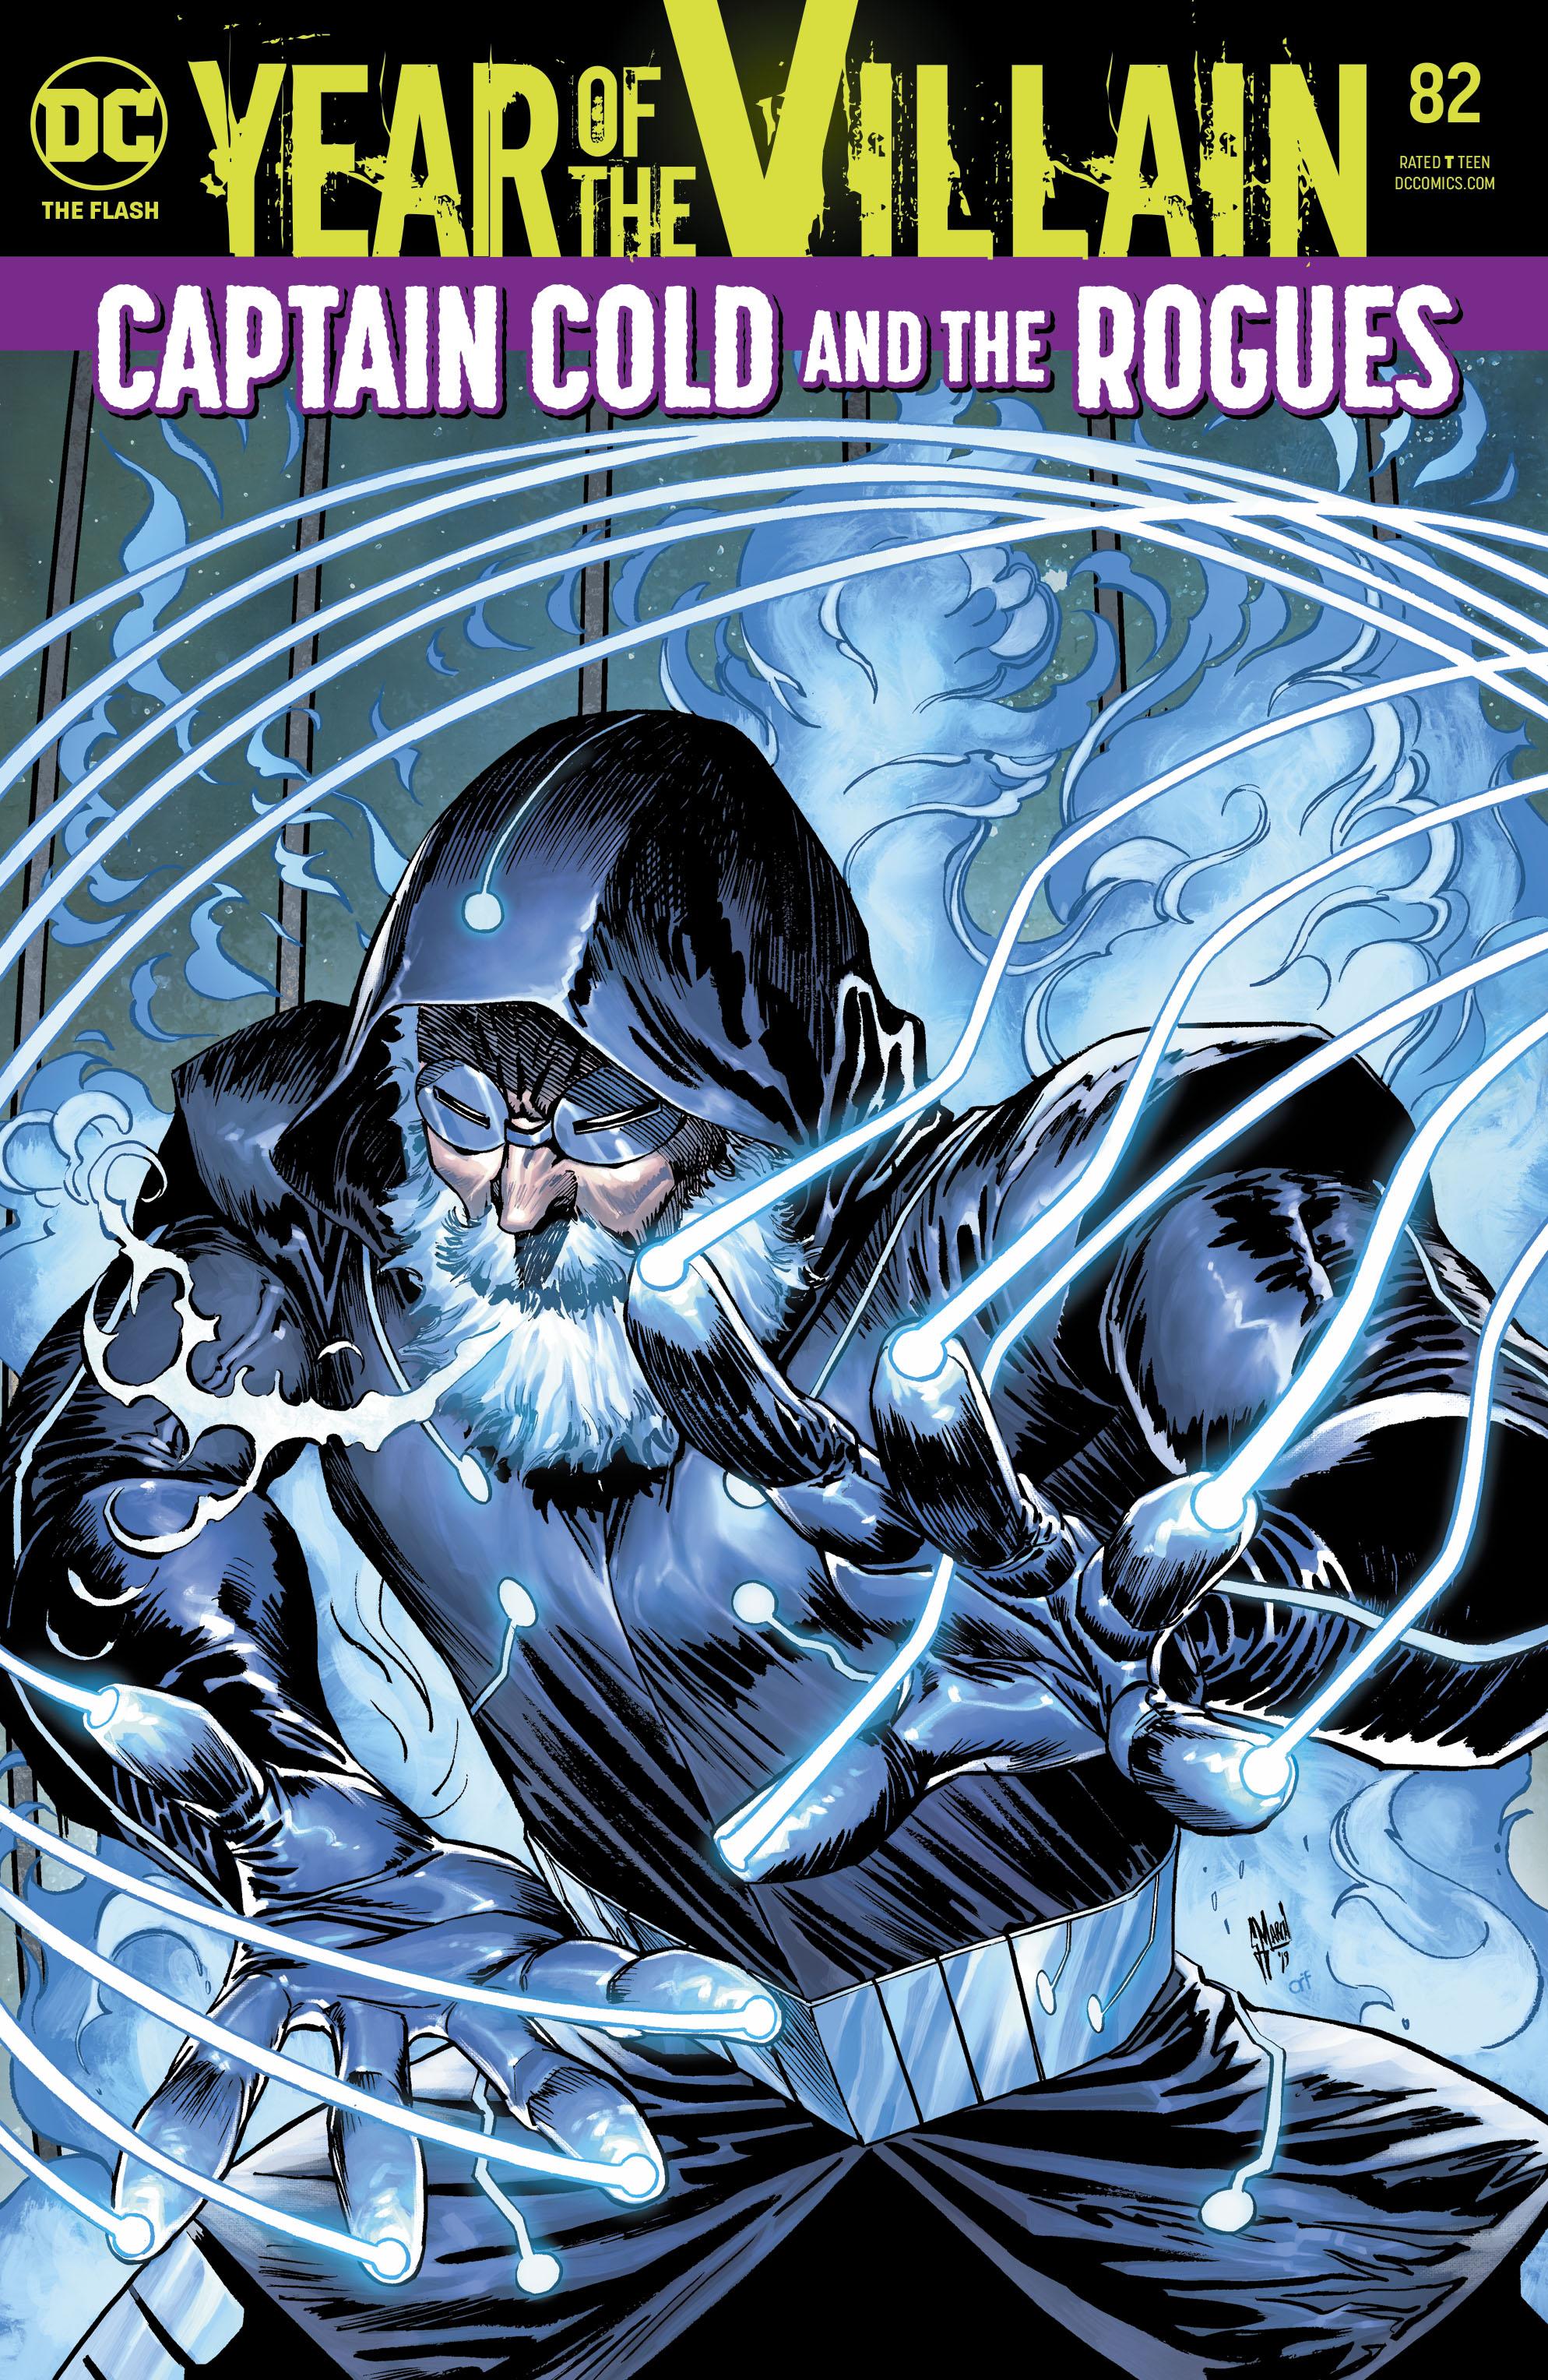 The Flash Vol 5 82